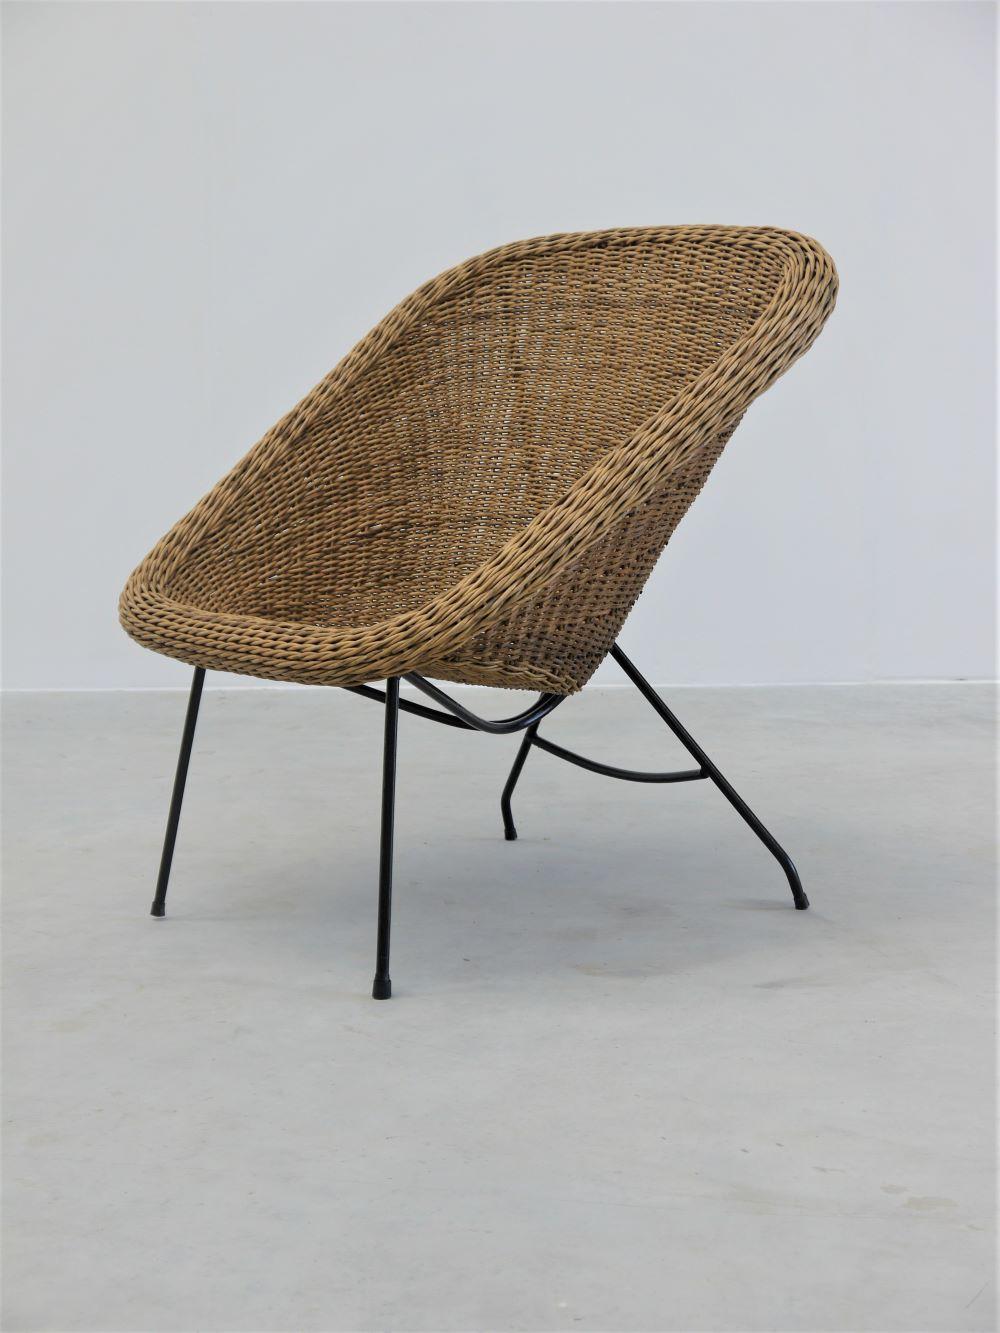 Carlo Hauner and Martin Eisler – Rare Concha Arm Chair